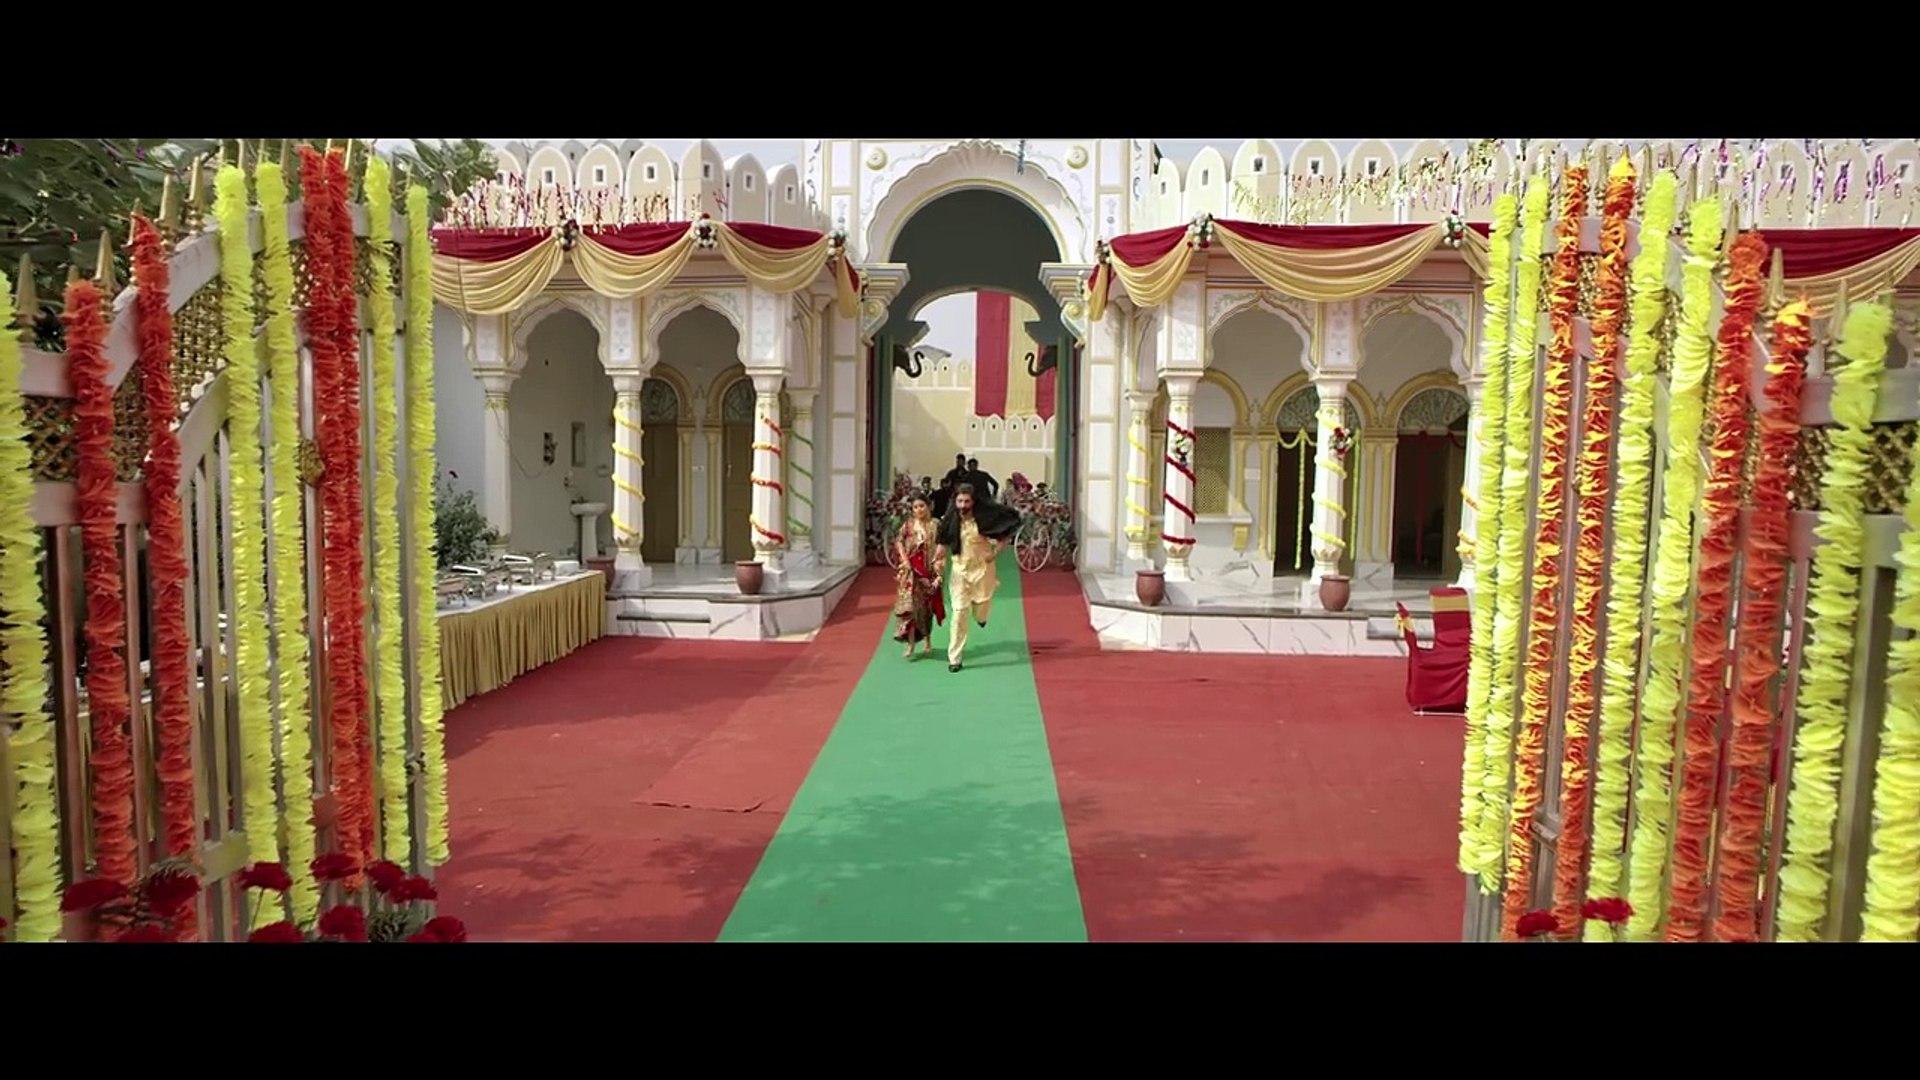 01.JAGGA JIUNDA E ( Official Trailer ) _ Daljeet Kalsi , Kainaat, Jackie Shroff _ Rel. on 3rd August